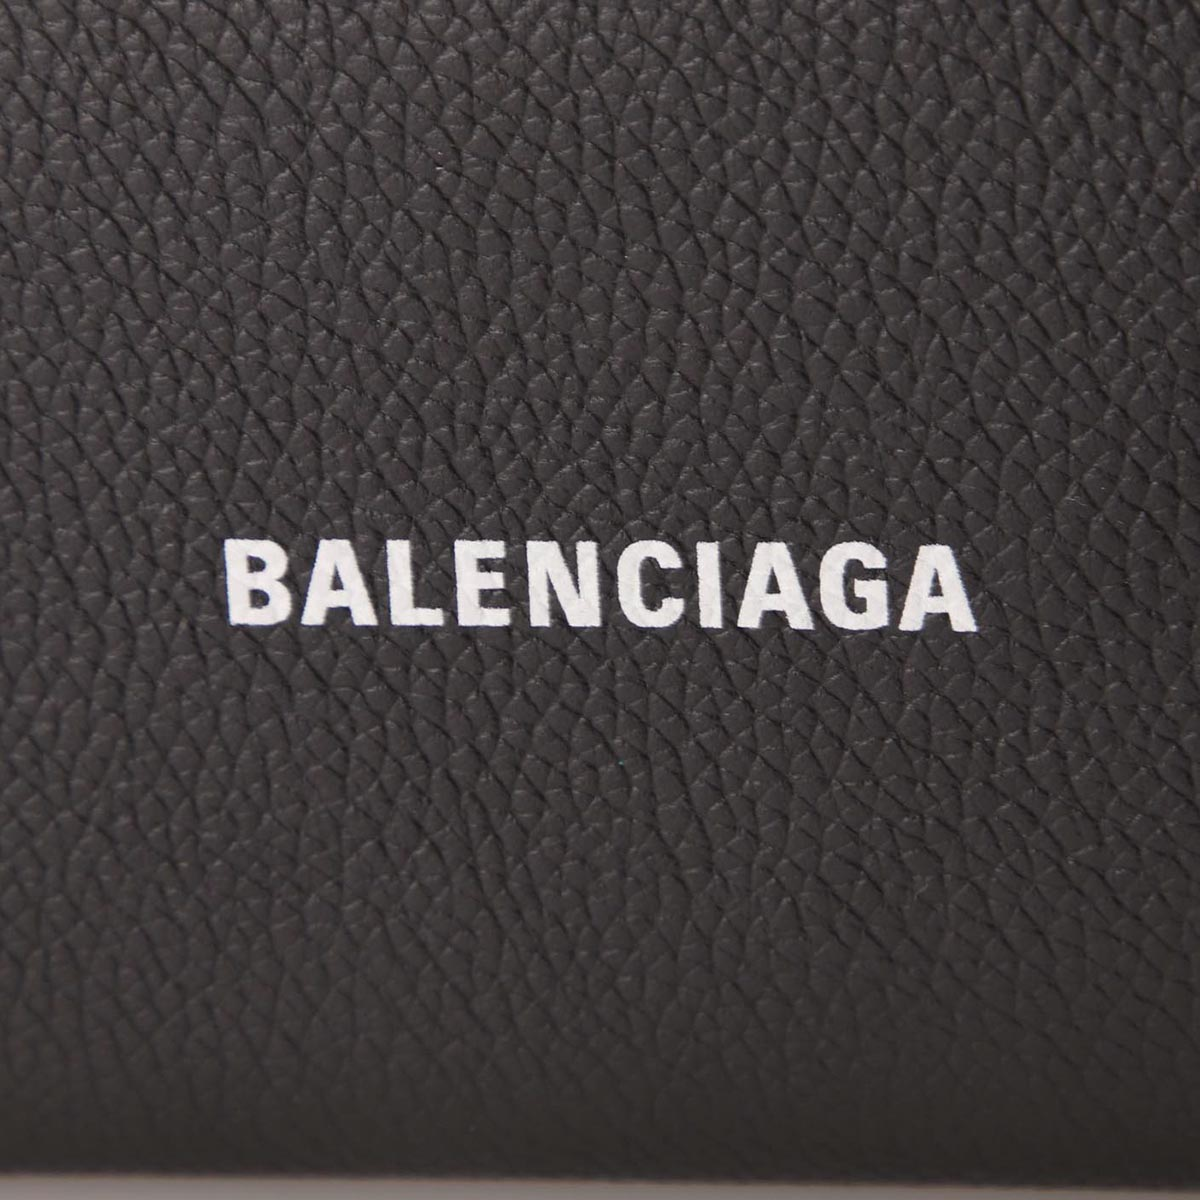 BALENCIAGA バレンシアガ 2つ折り財布 小銭入れ付き/CASH メンズ